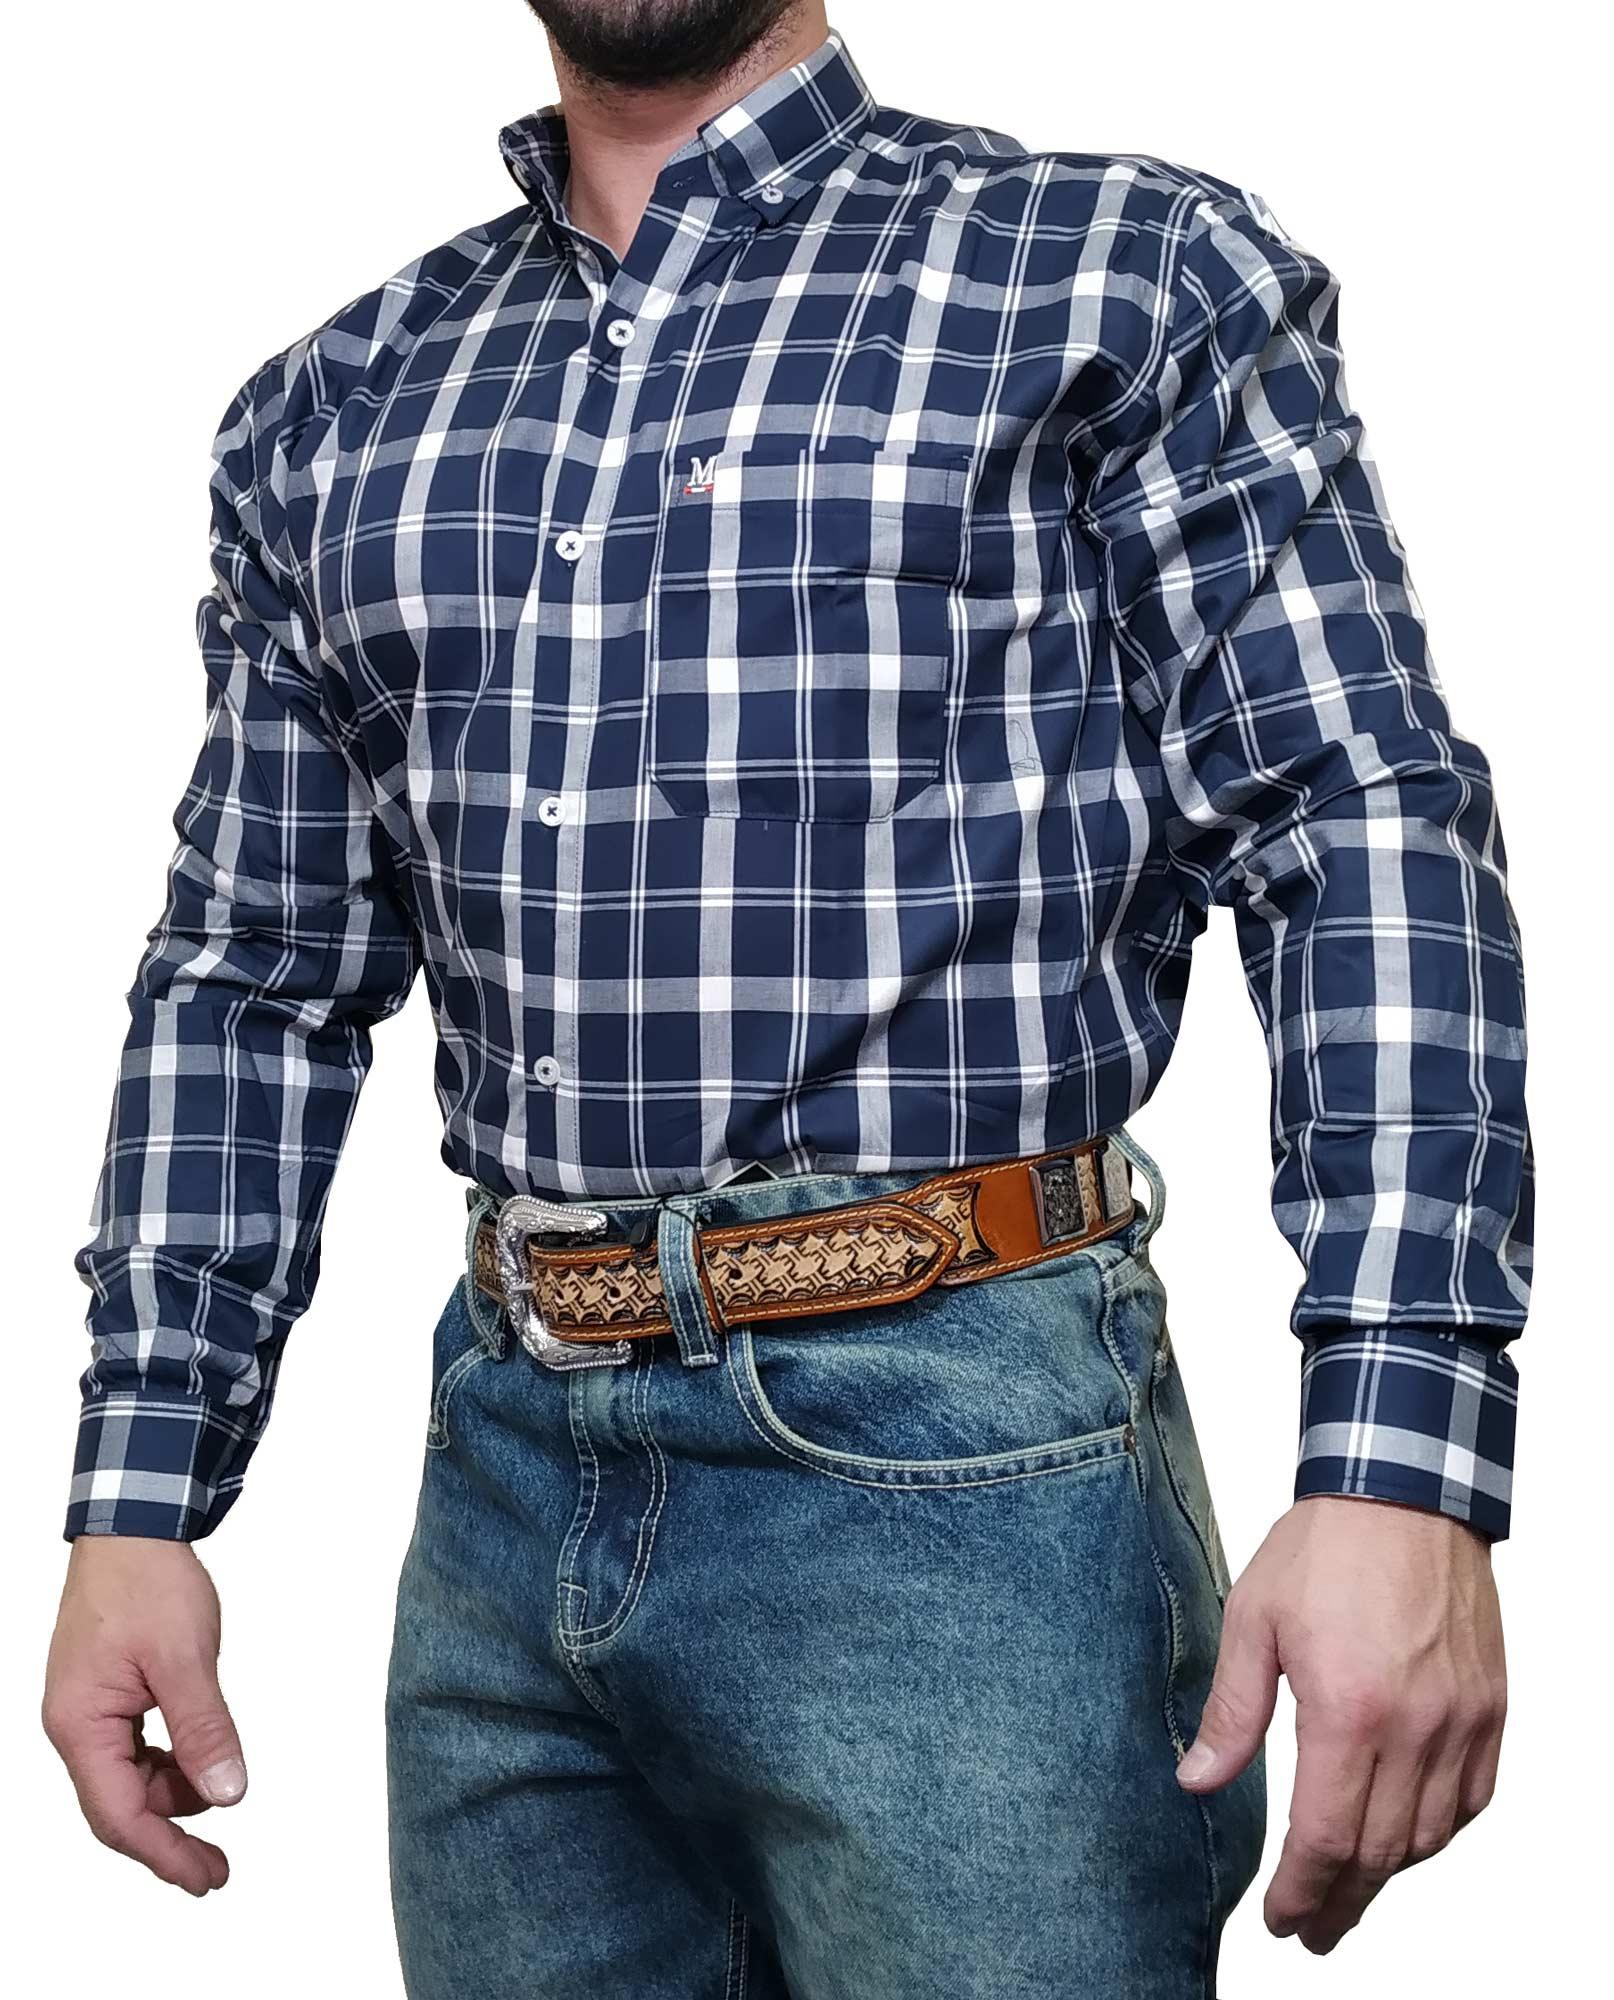 Camisa Masculina Minuty Country Ref. Xadrez Azul / Branco